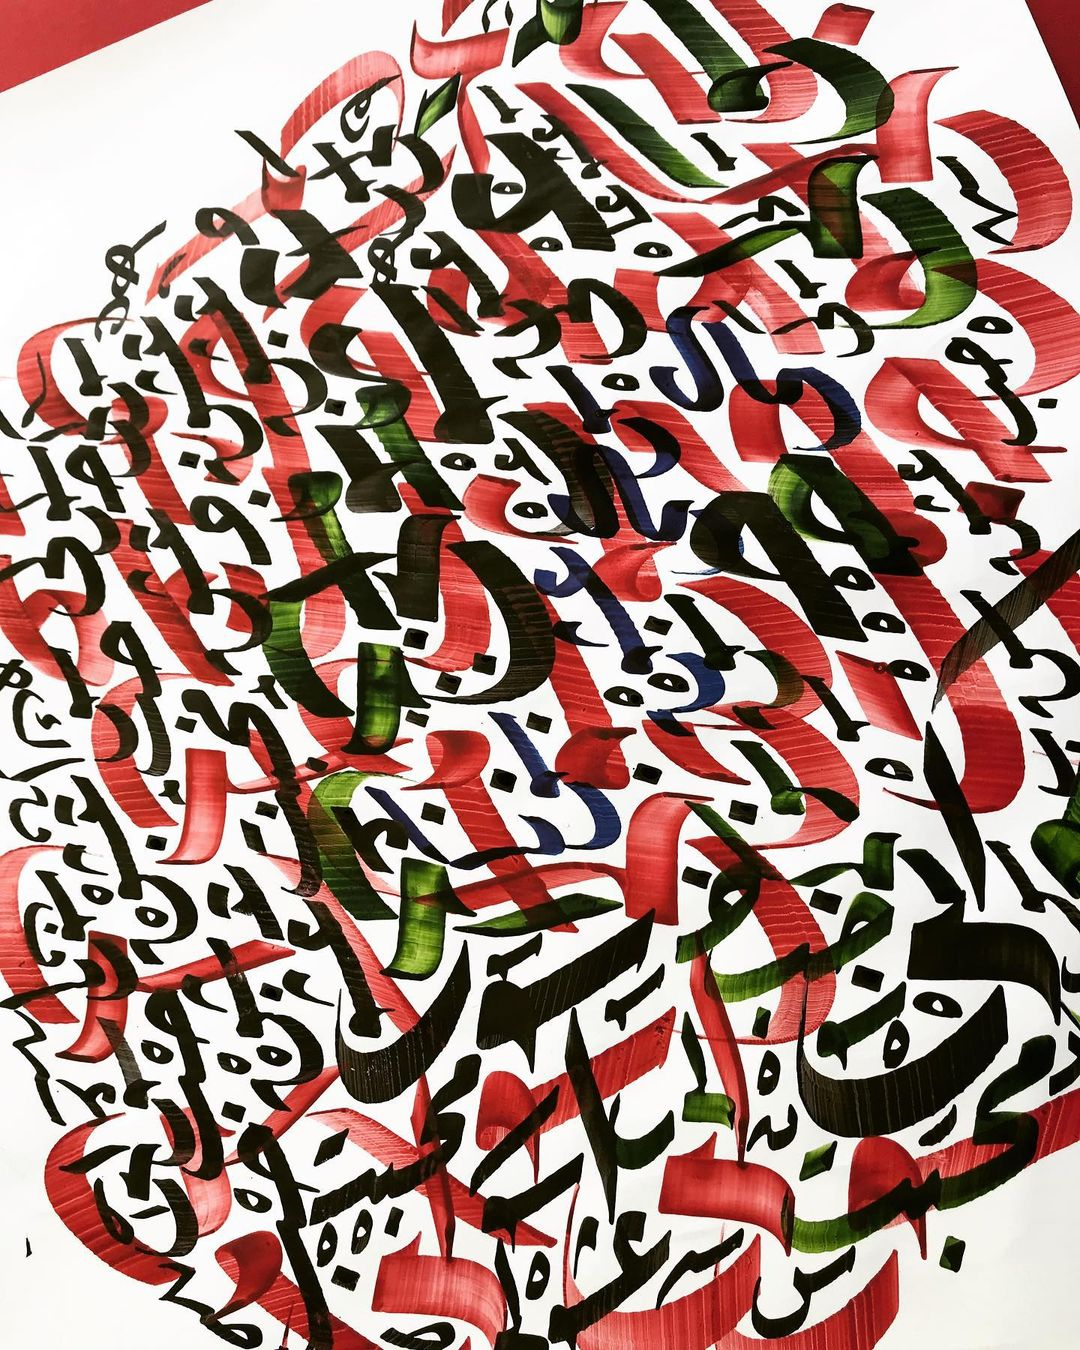 Donwload Photo #exercise #arabiccalligraphy #islamiccalligraphy #tezhip #hüsnühat #hüsnihat ...- hattat_aa 3